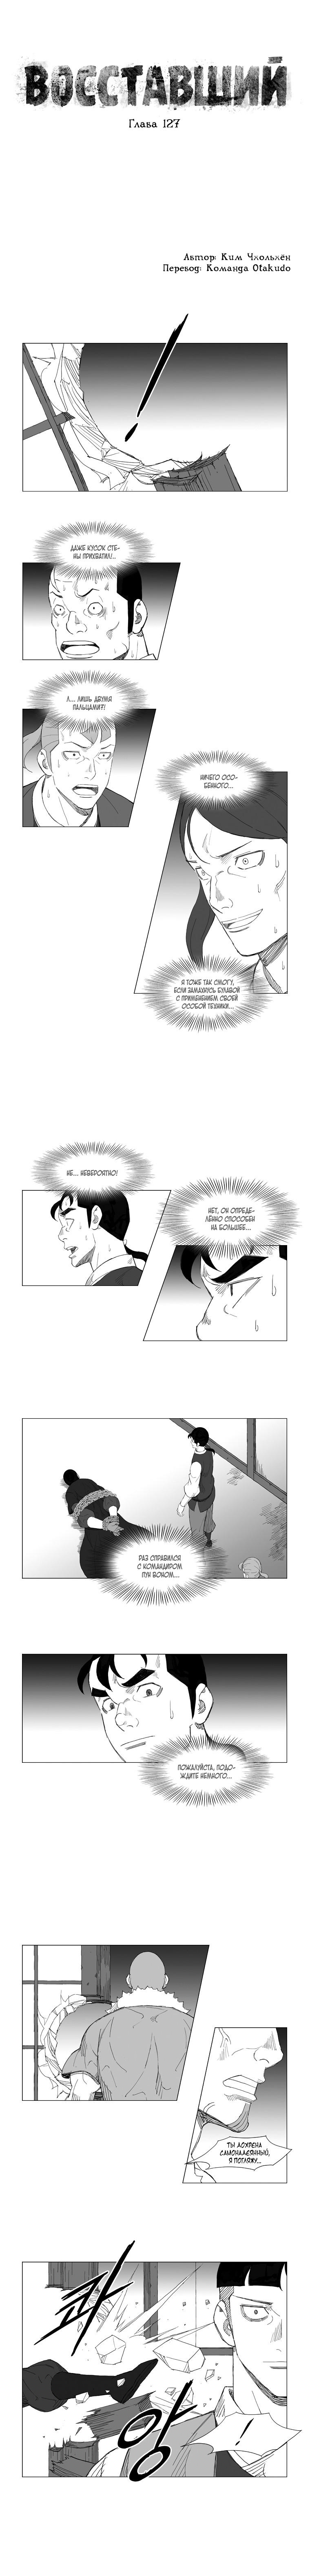 https://r1.ninemanga.com/comics/pic2/39/28263/416252/1532707582853.jpg Page 1